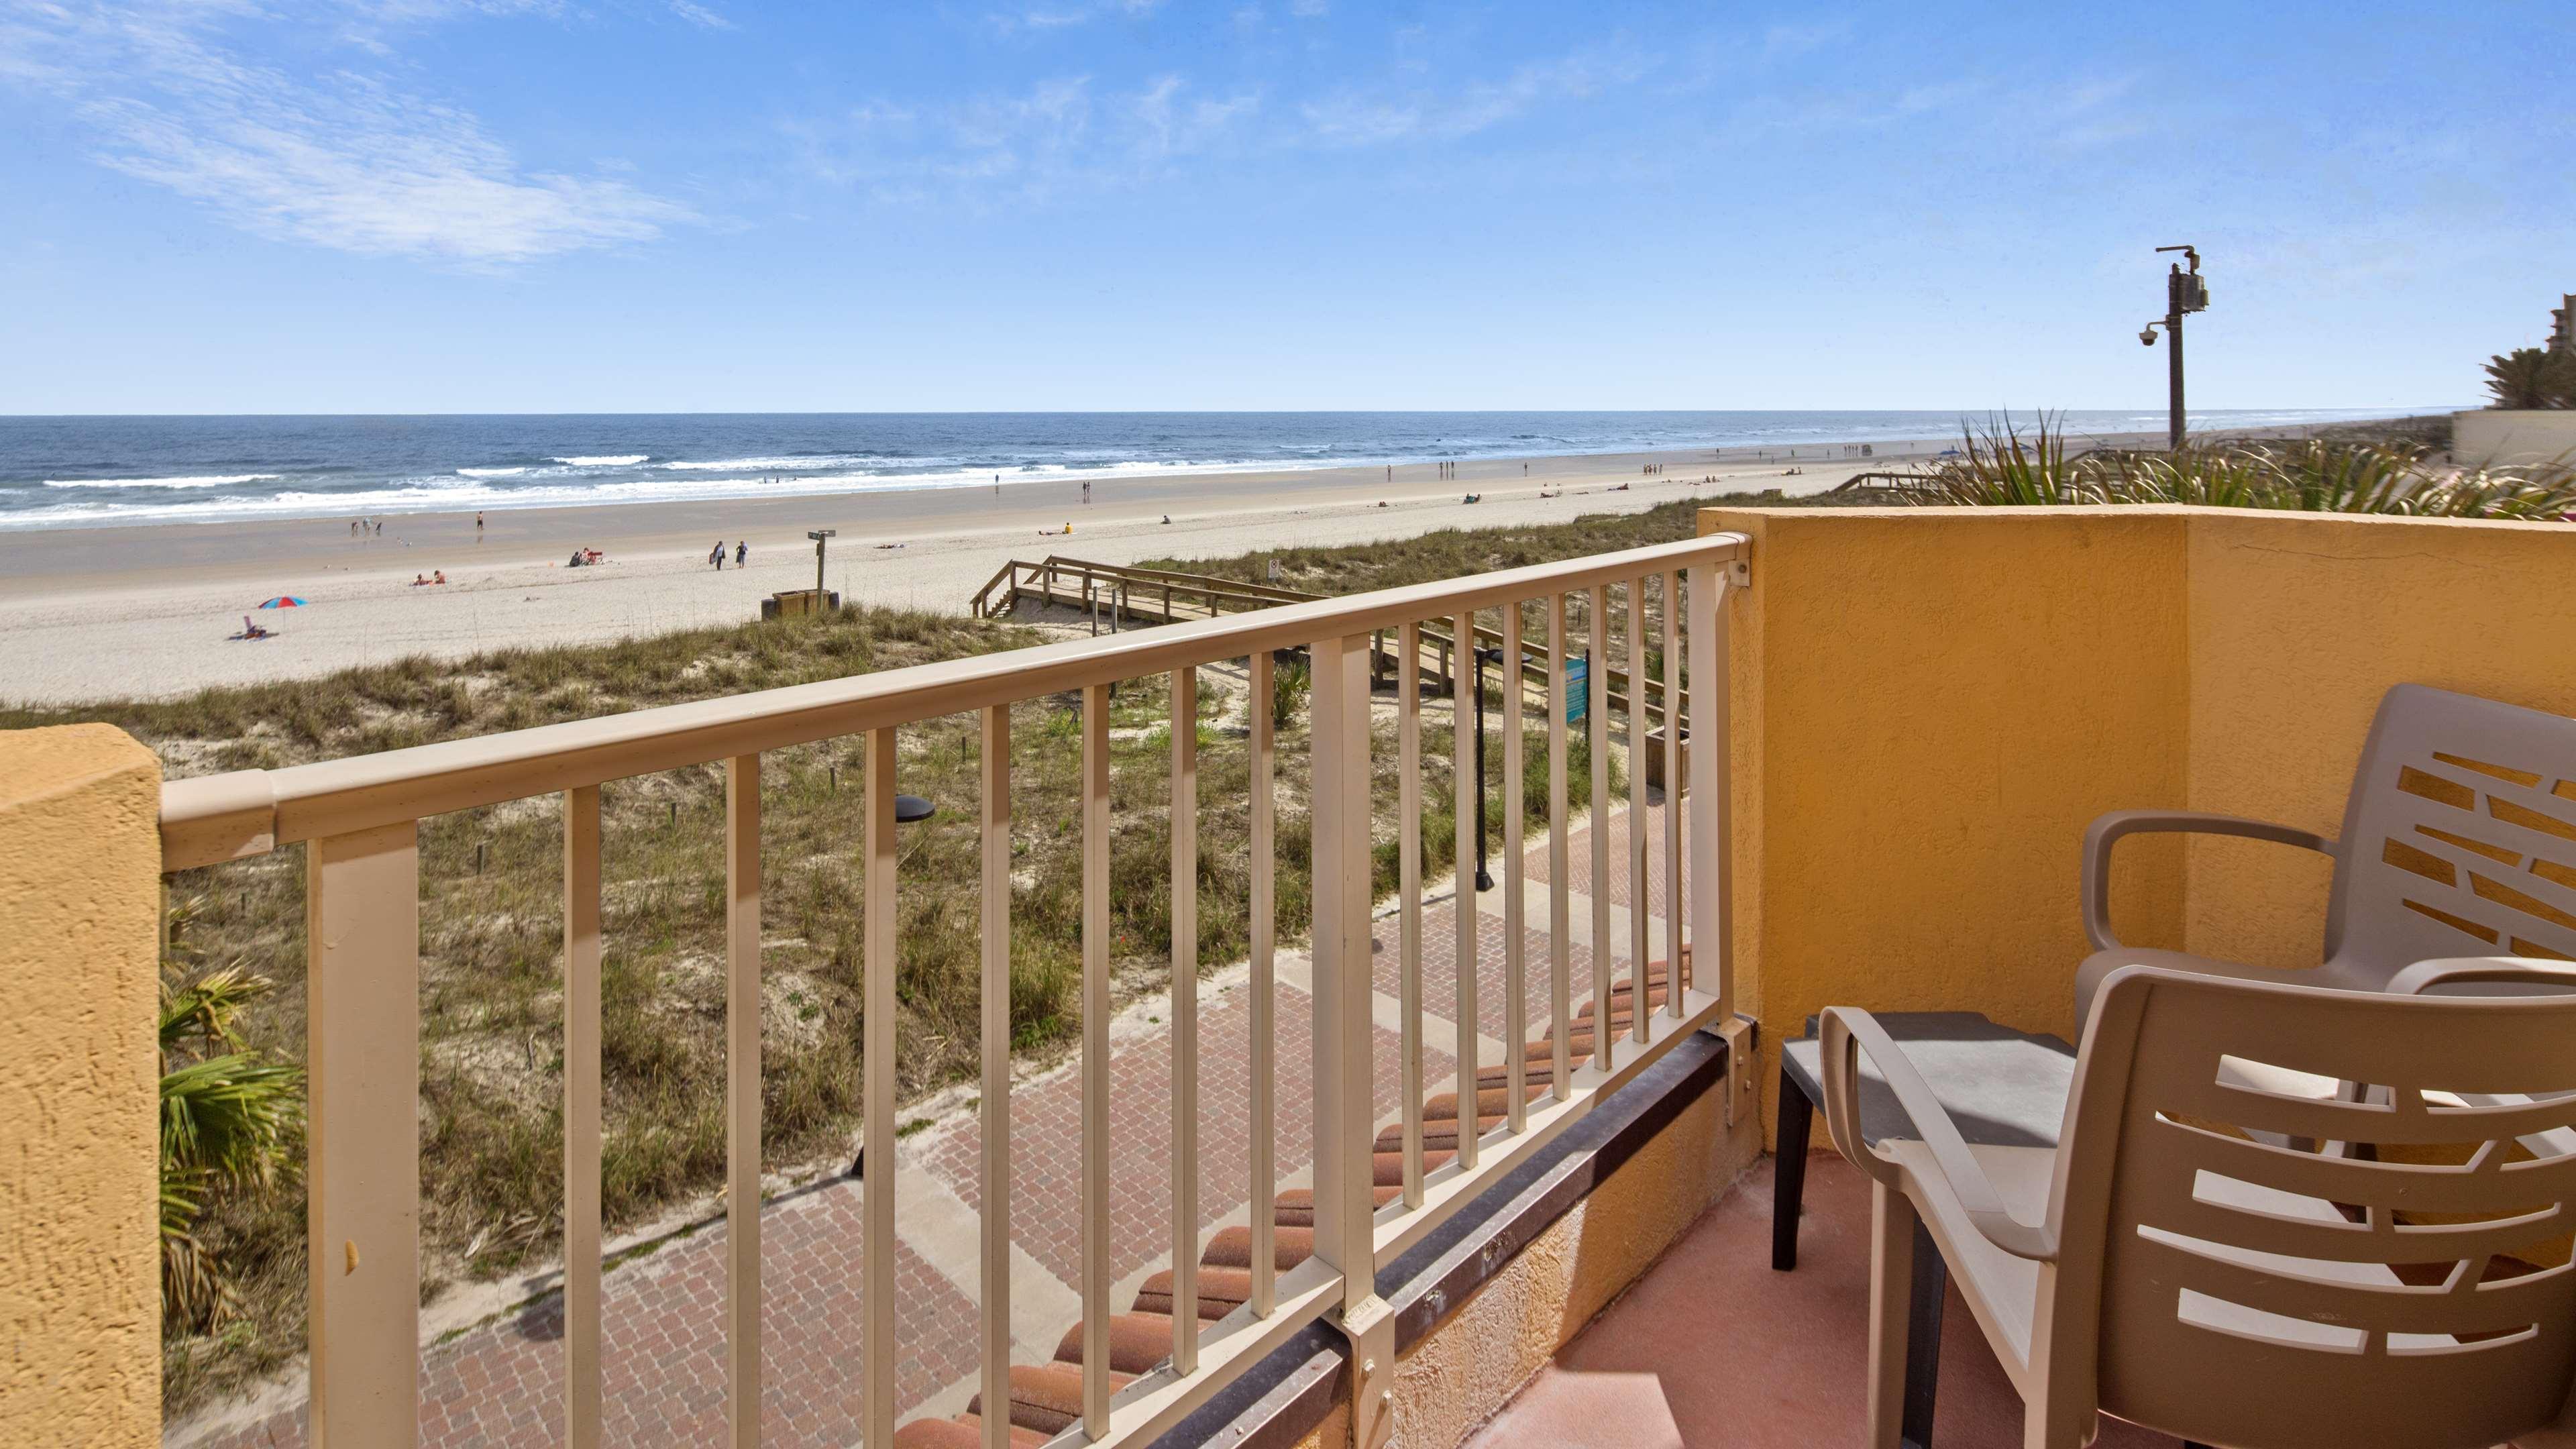 Beachfront Bed And Breakfast Jacksonville Fl